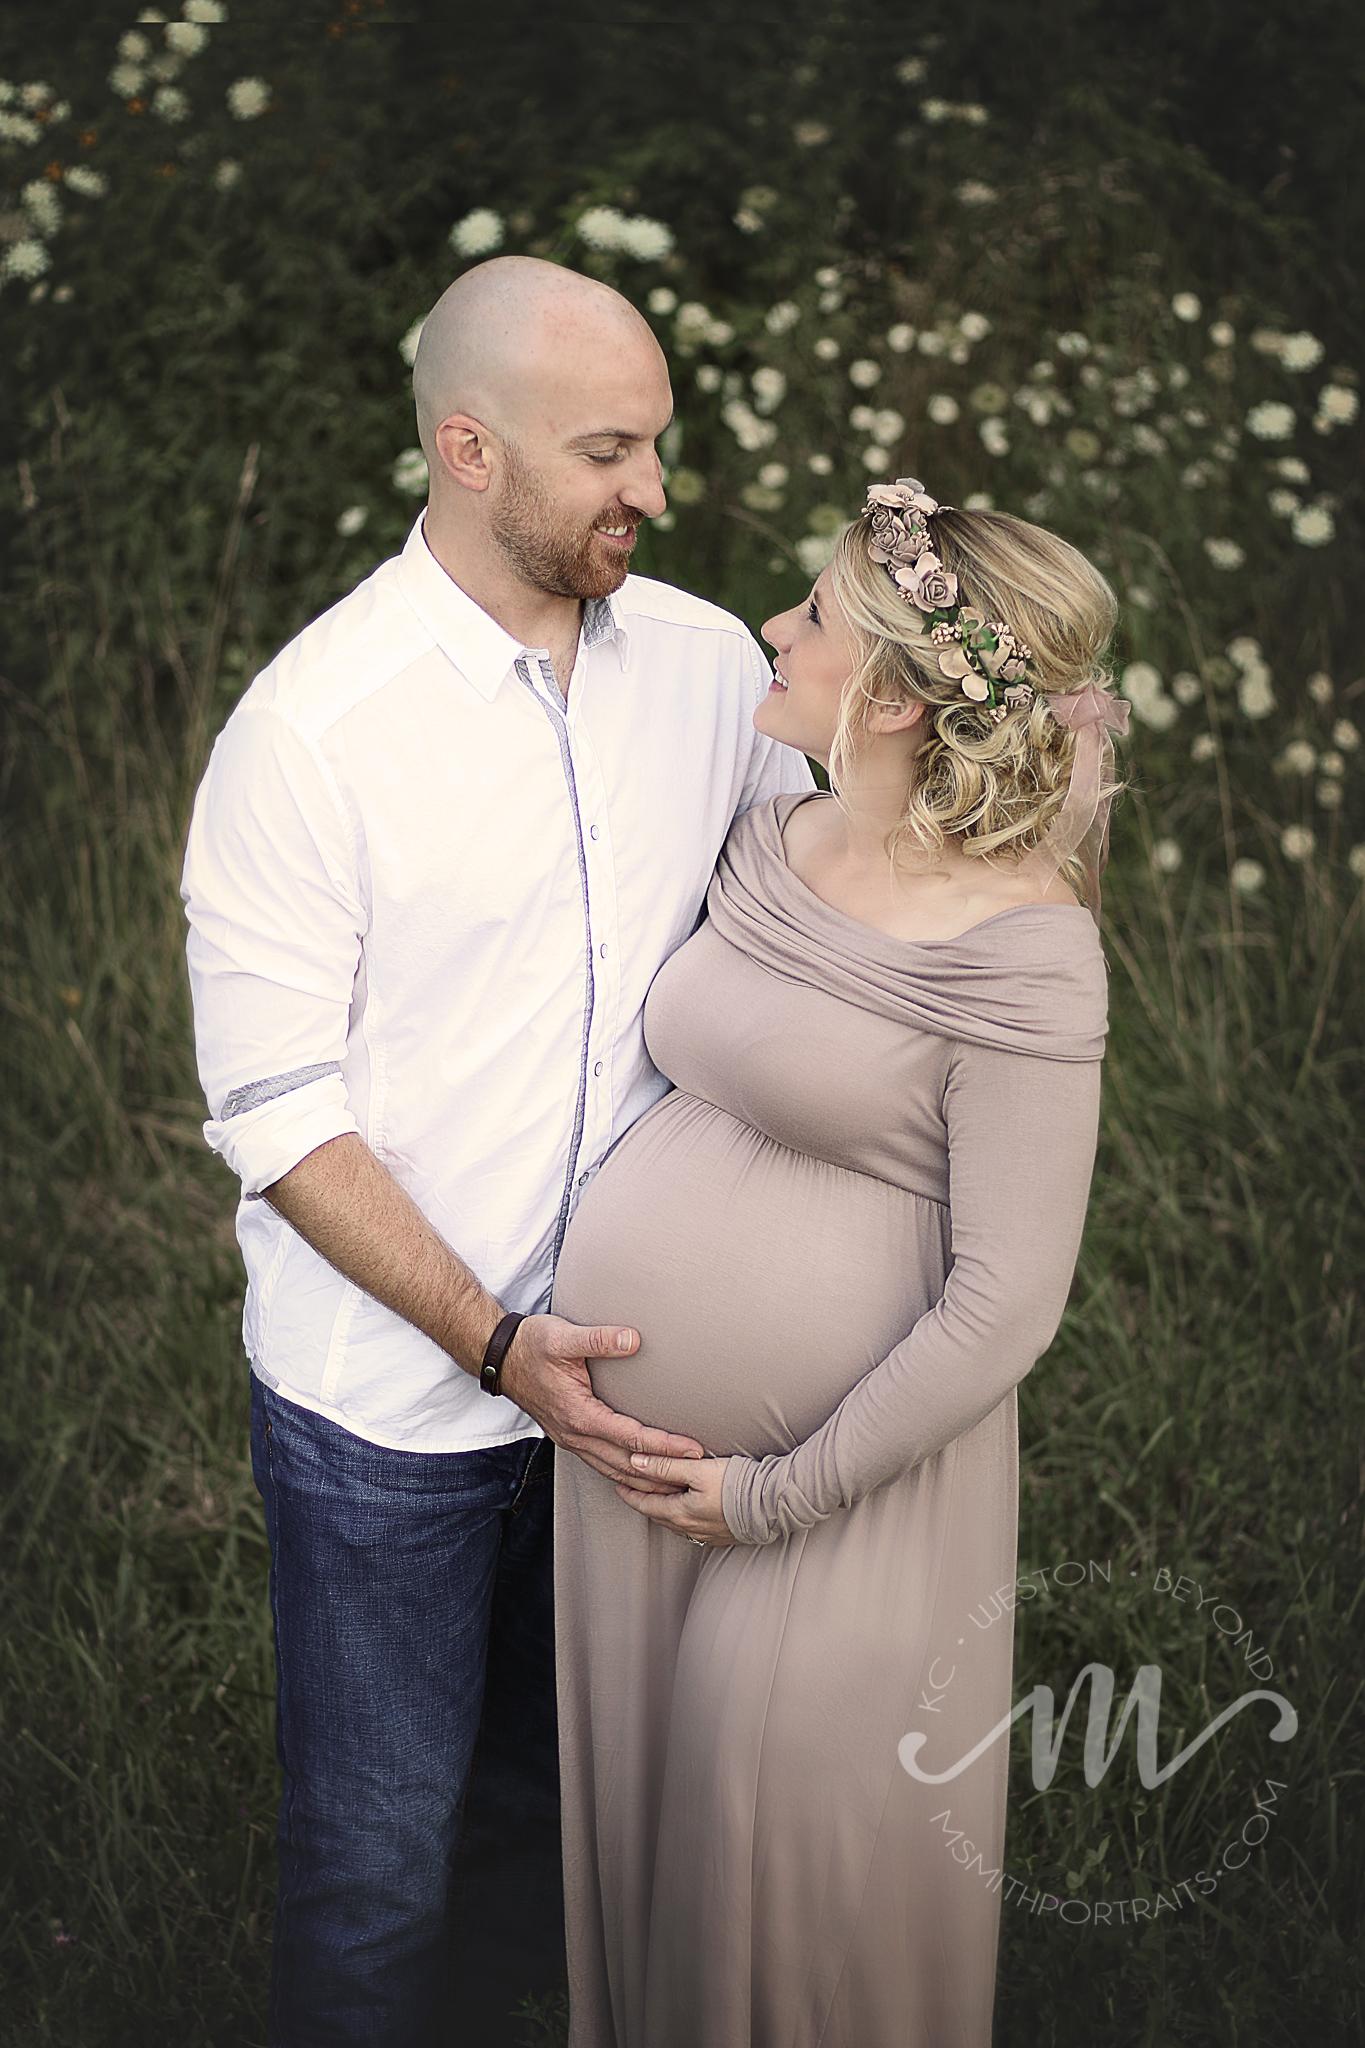 Husband and wife maternity photo